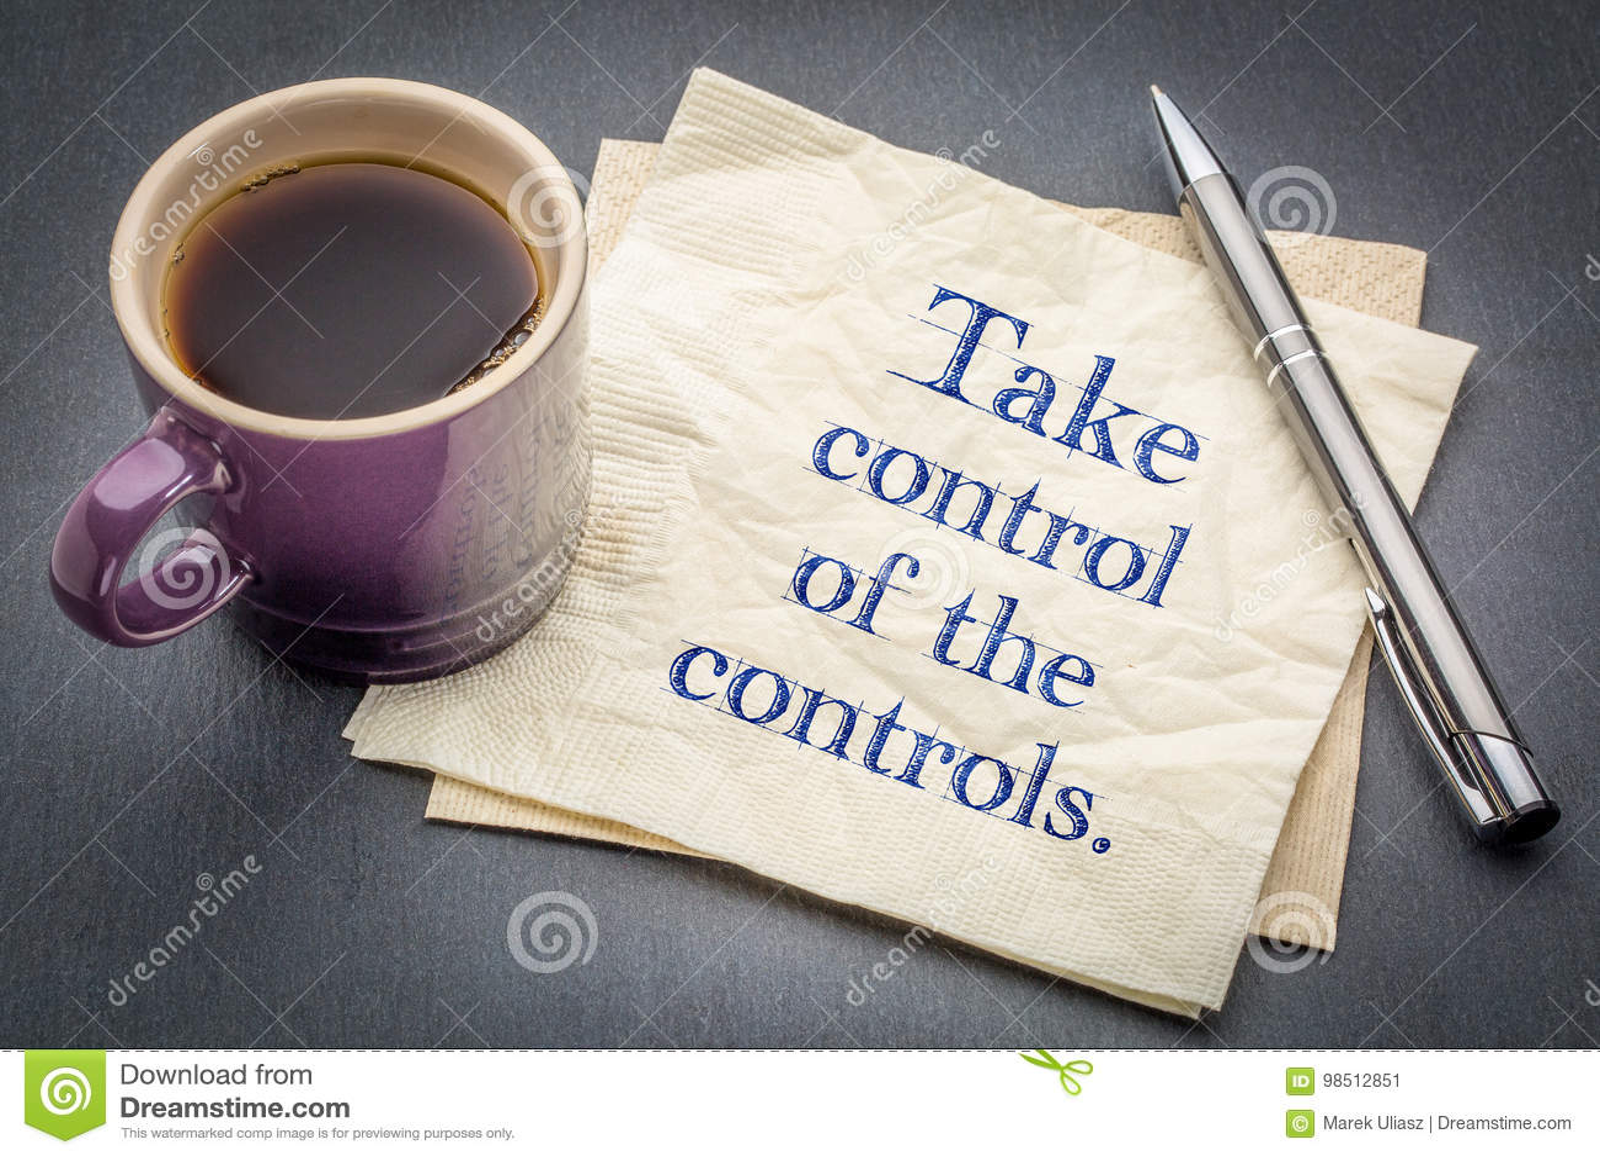 Tome o controle dos controles